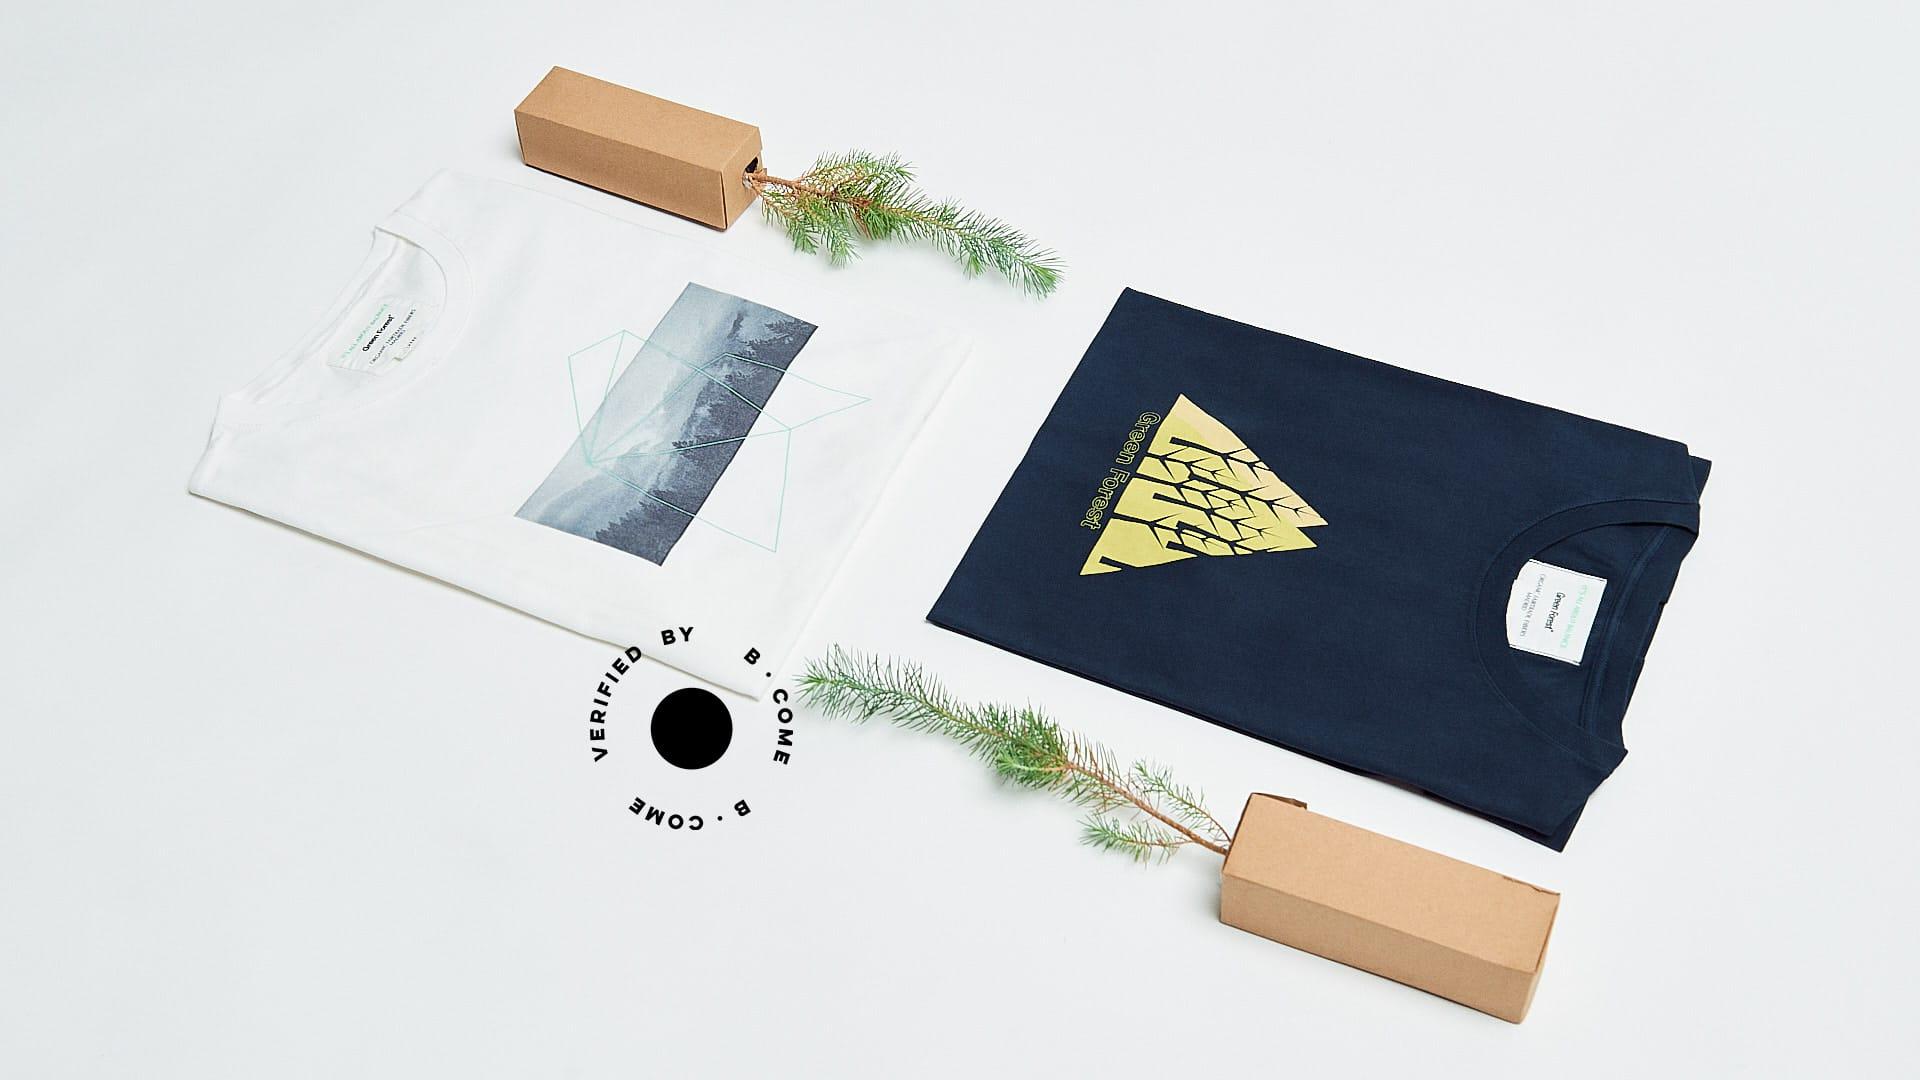 camisetas ecológicas de algodón orgánico Green Forest Wear